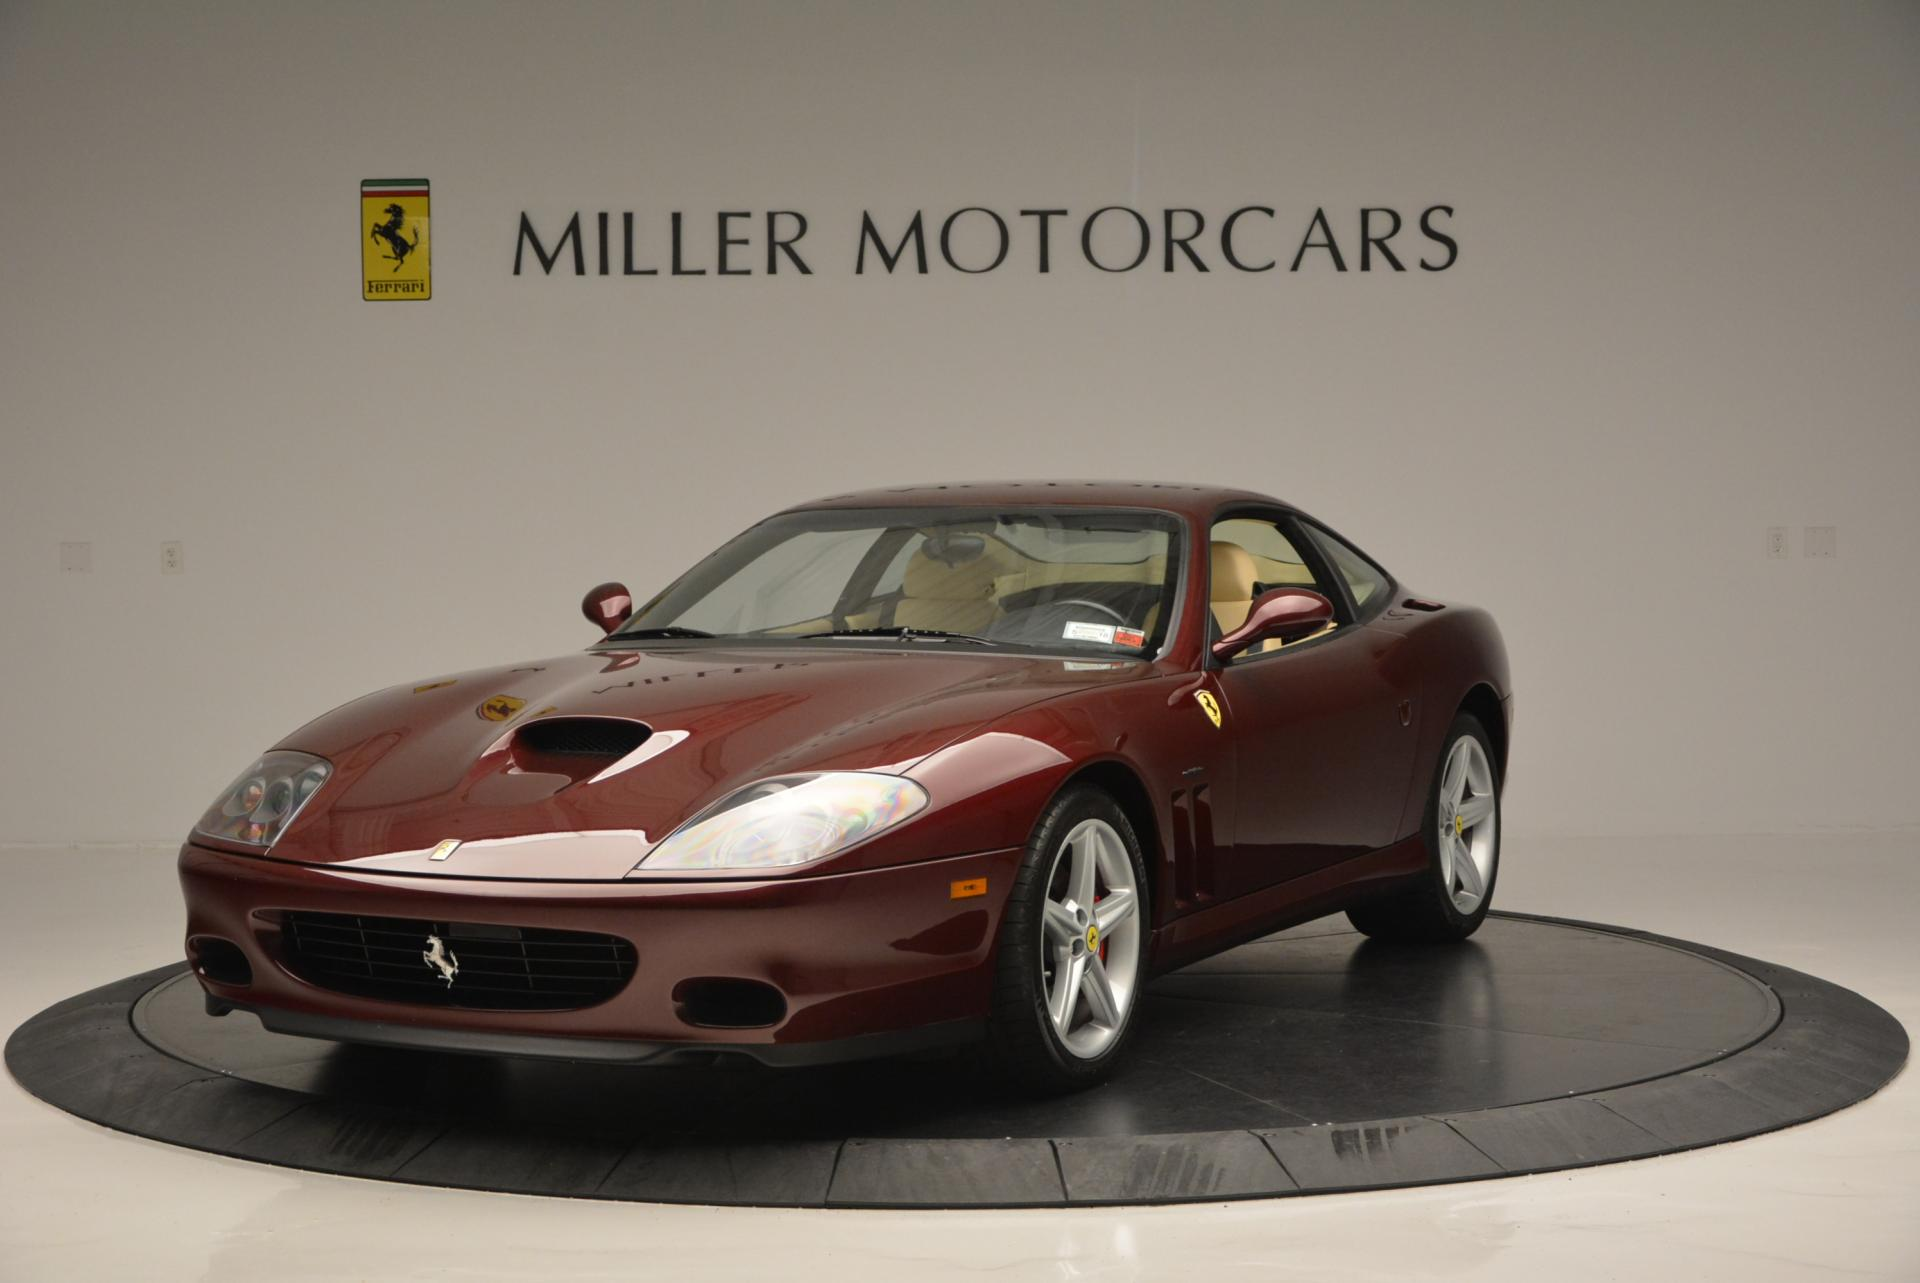 Used 2003 Ferrari 575M Maranello 6-Speed Manual for sale Sold at Maserati of Westport in Westport CT 06880 1